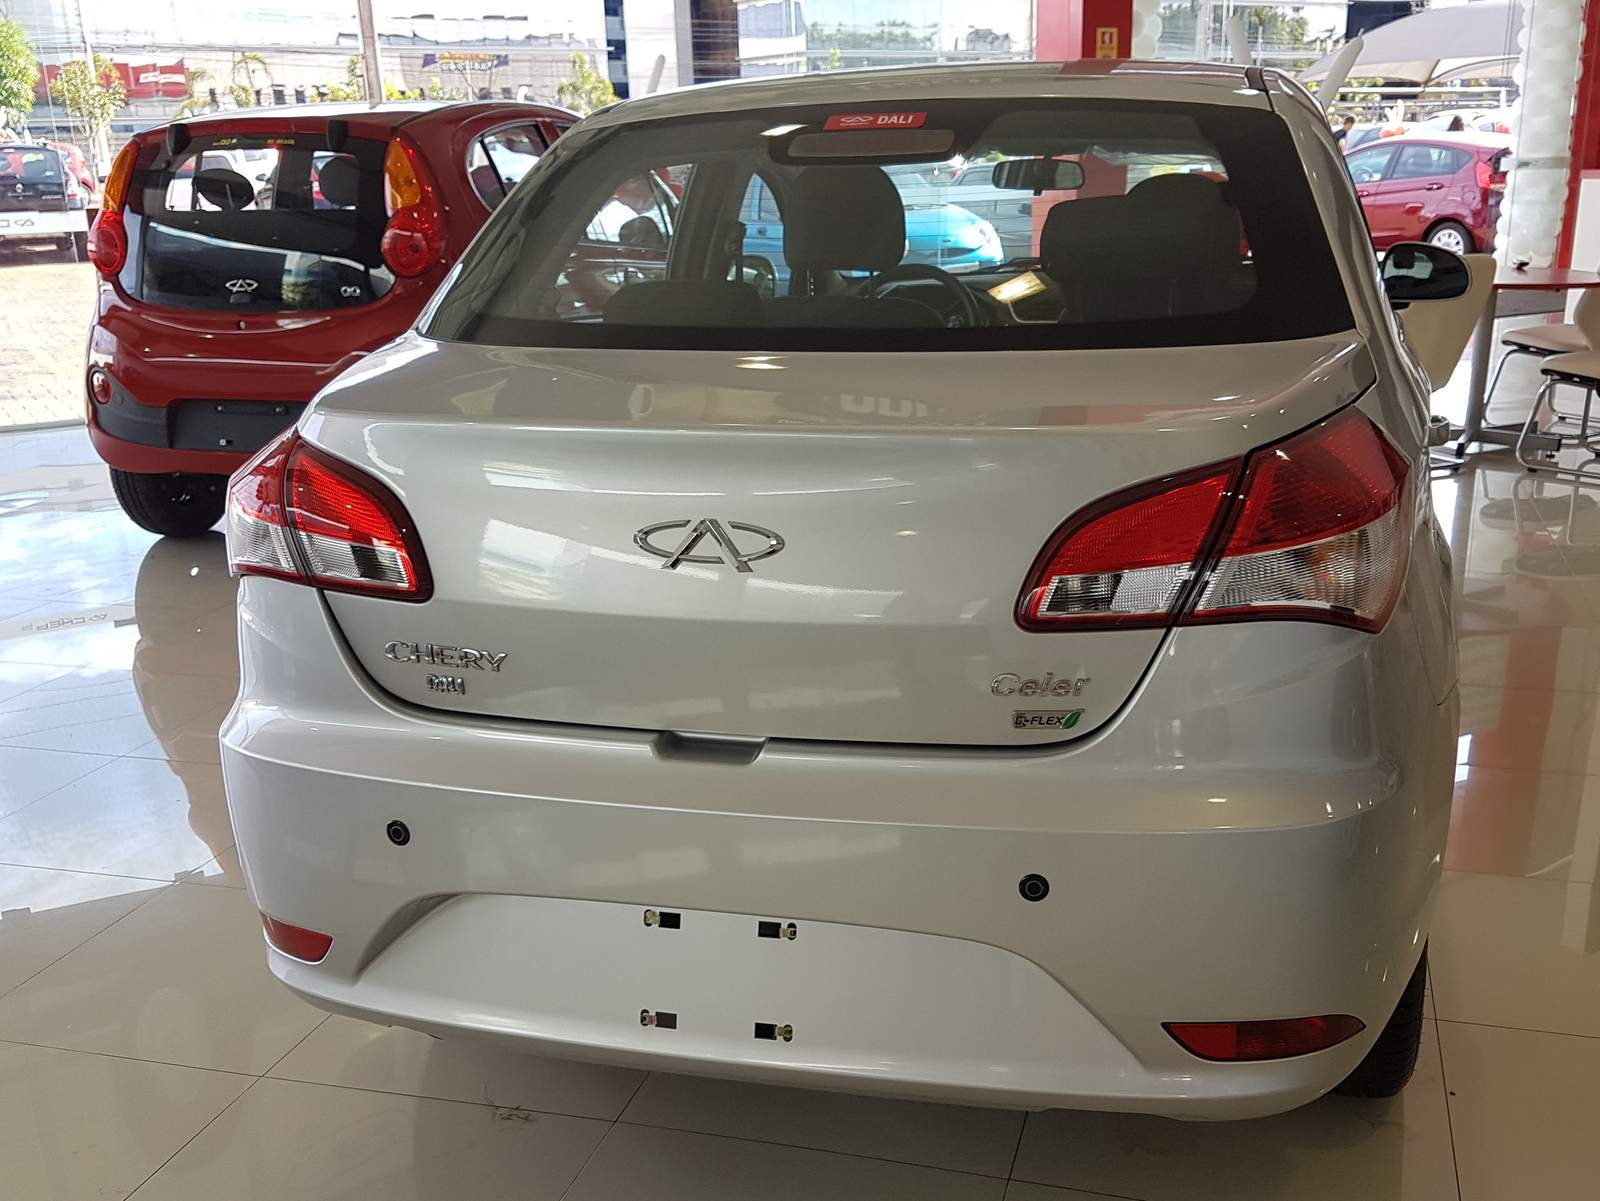 Chery Celer Sedan 2016 Esta Sendo Vendido A R 32 900 Car Blog Br